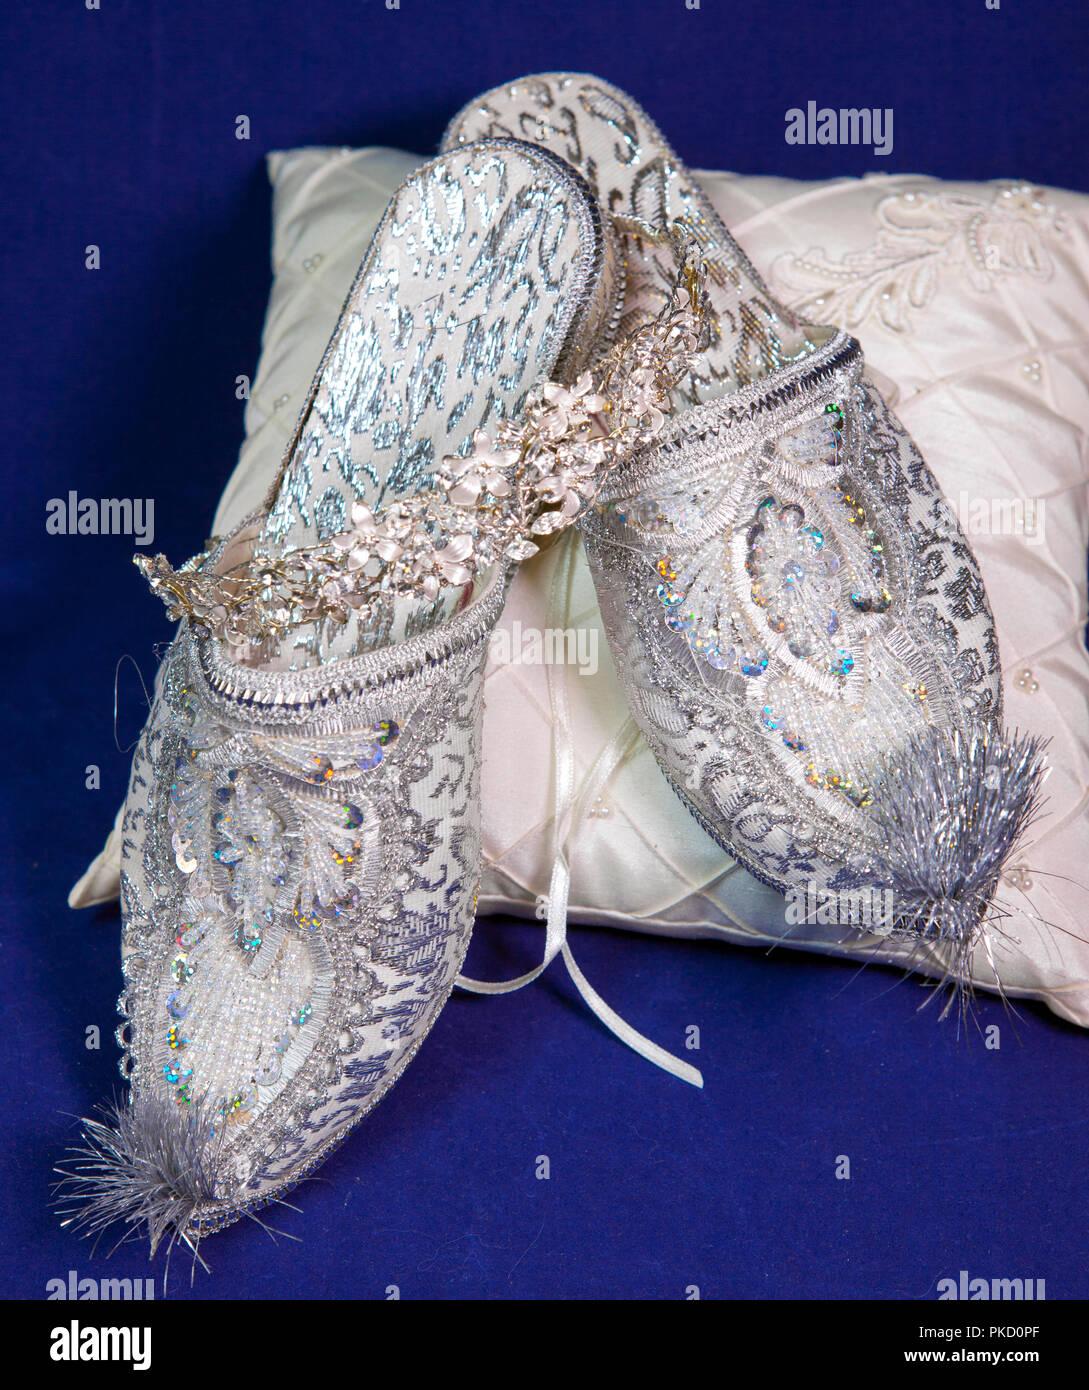 East style bride wedding shoes on a blue velvet - Stock Image